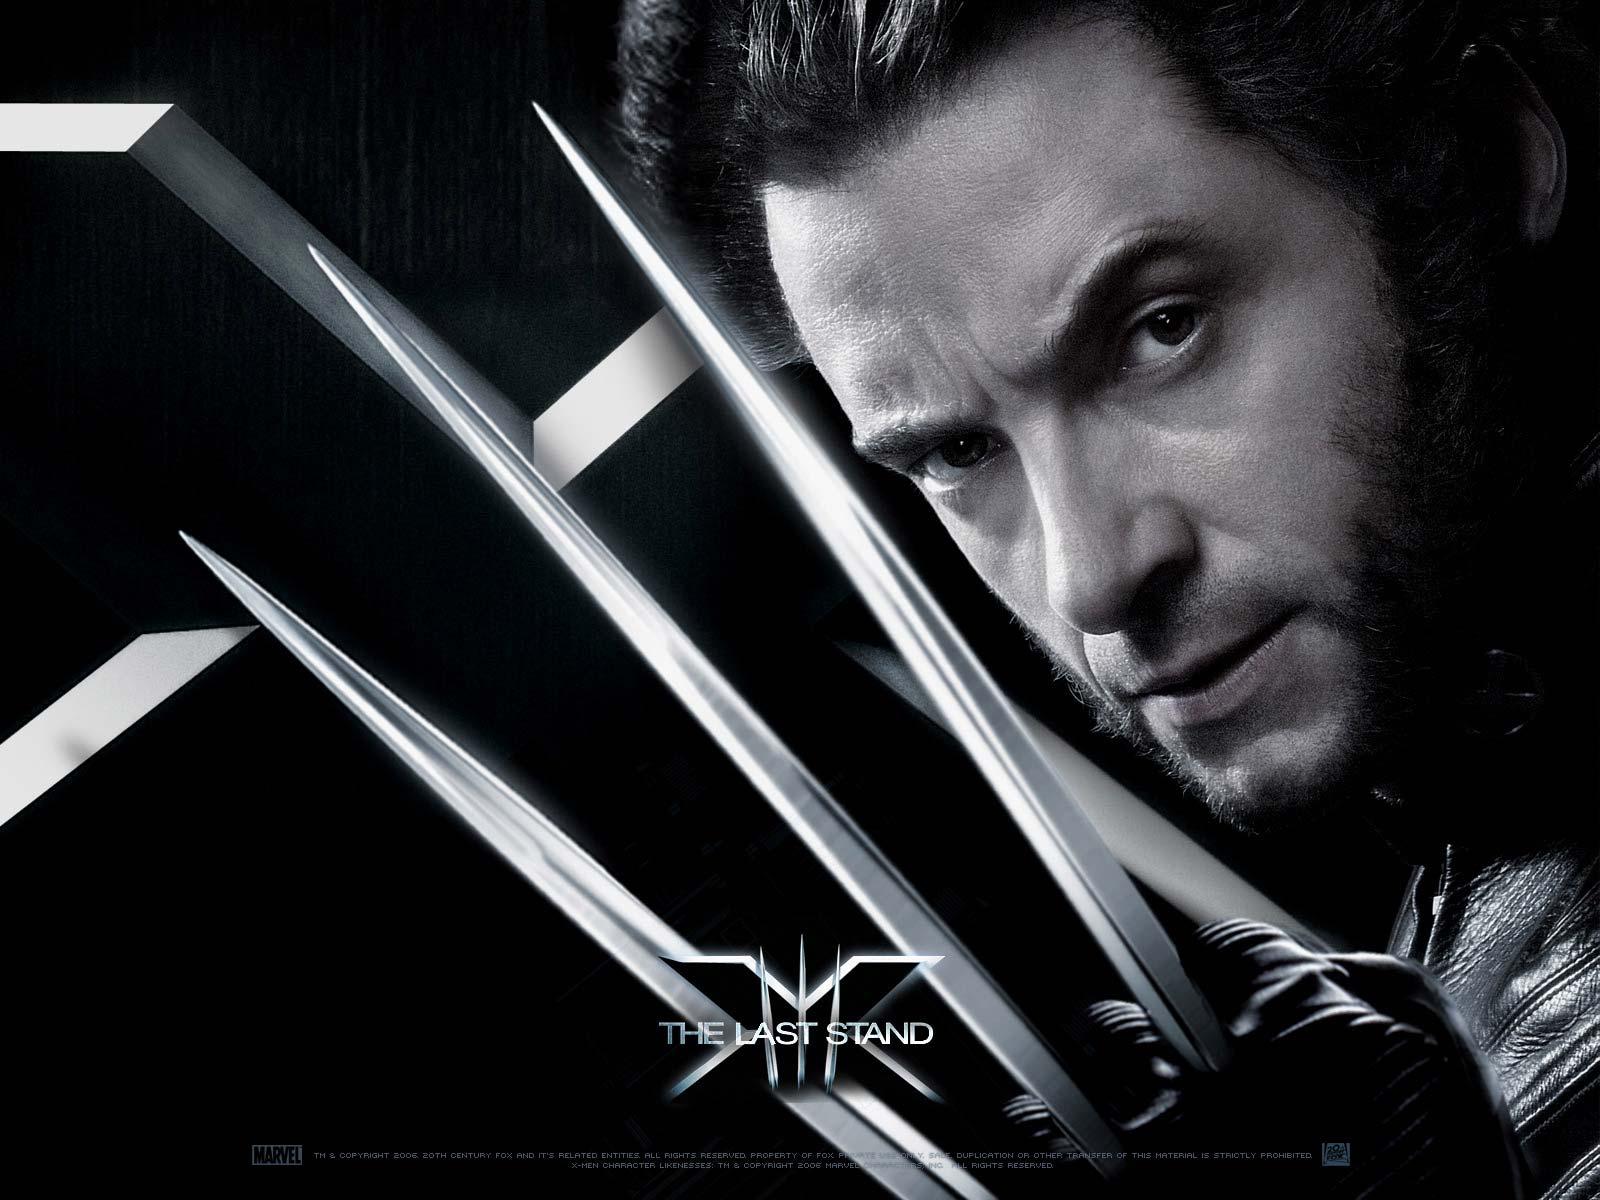 Hugh Jackman Wallpapers Hd: Wolverine Hugh Jackman Wallpapers 2016